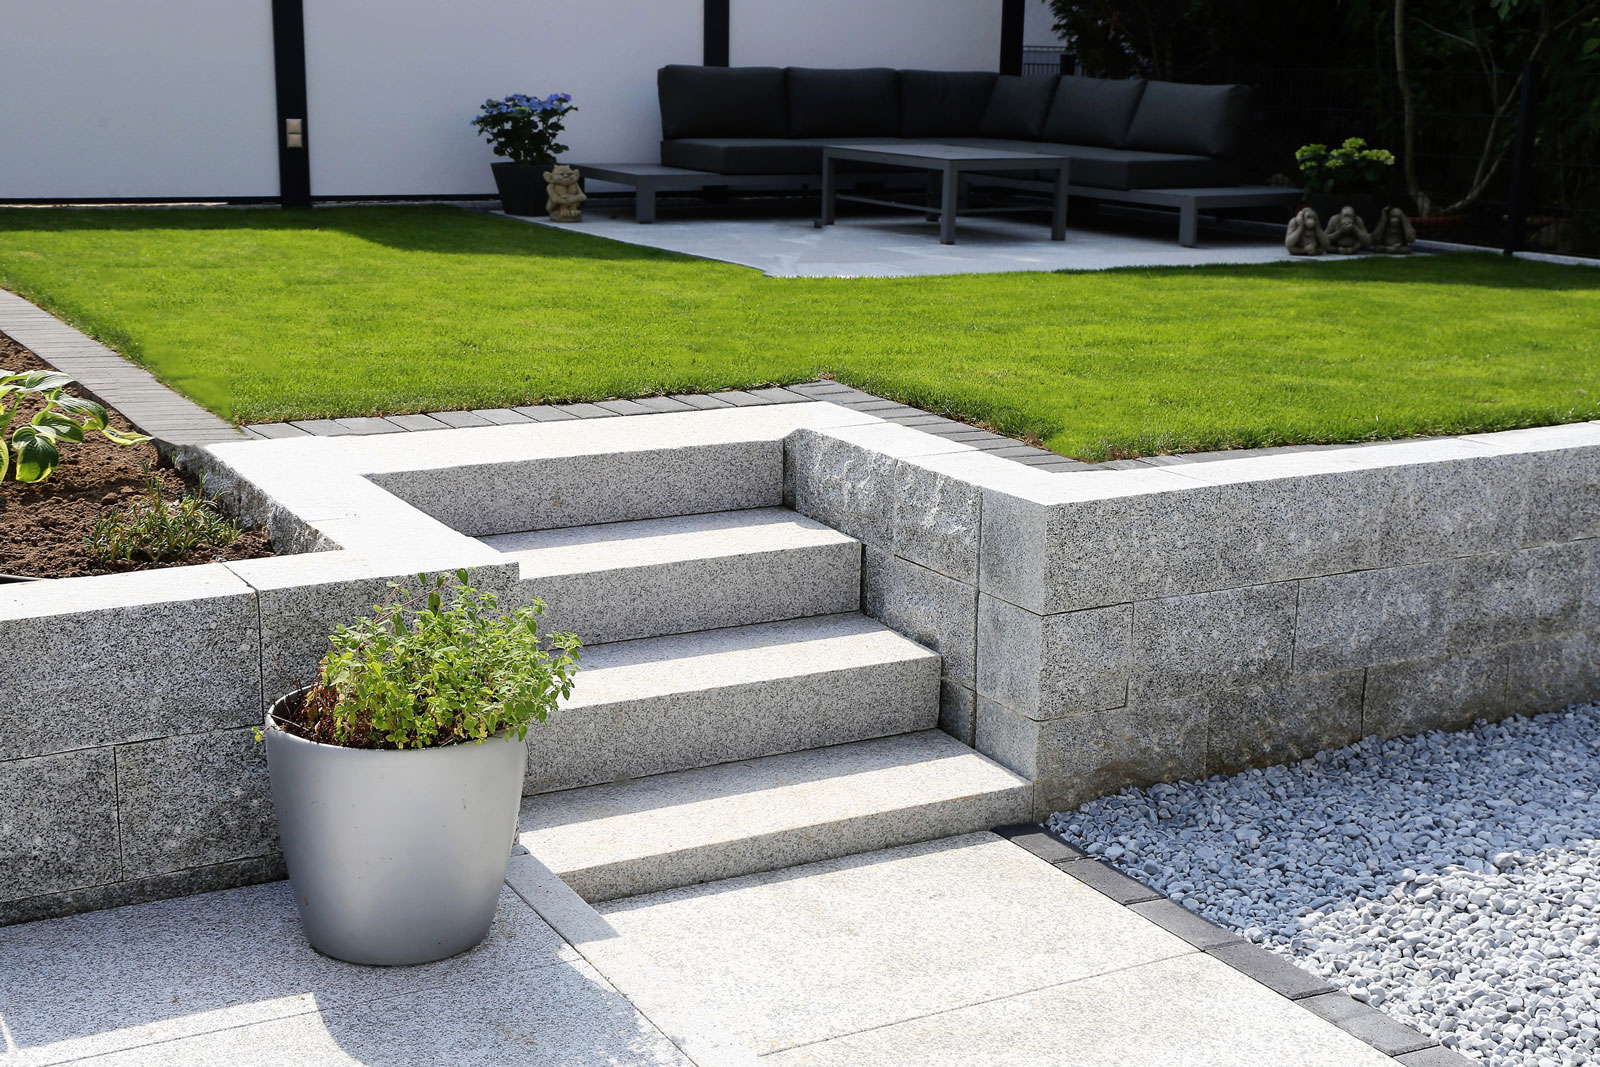 Moderner Garten: Klare Formen, Rasen, Terrasse